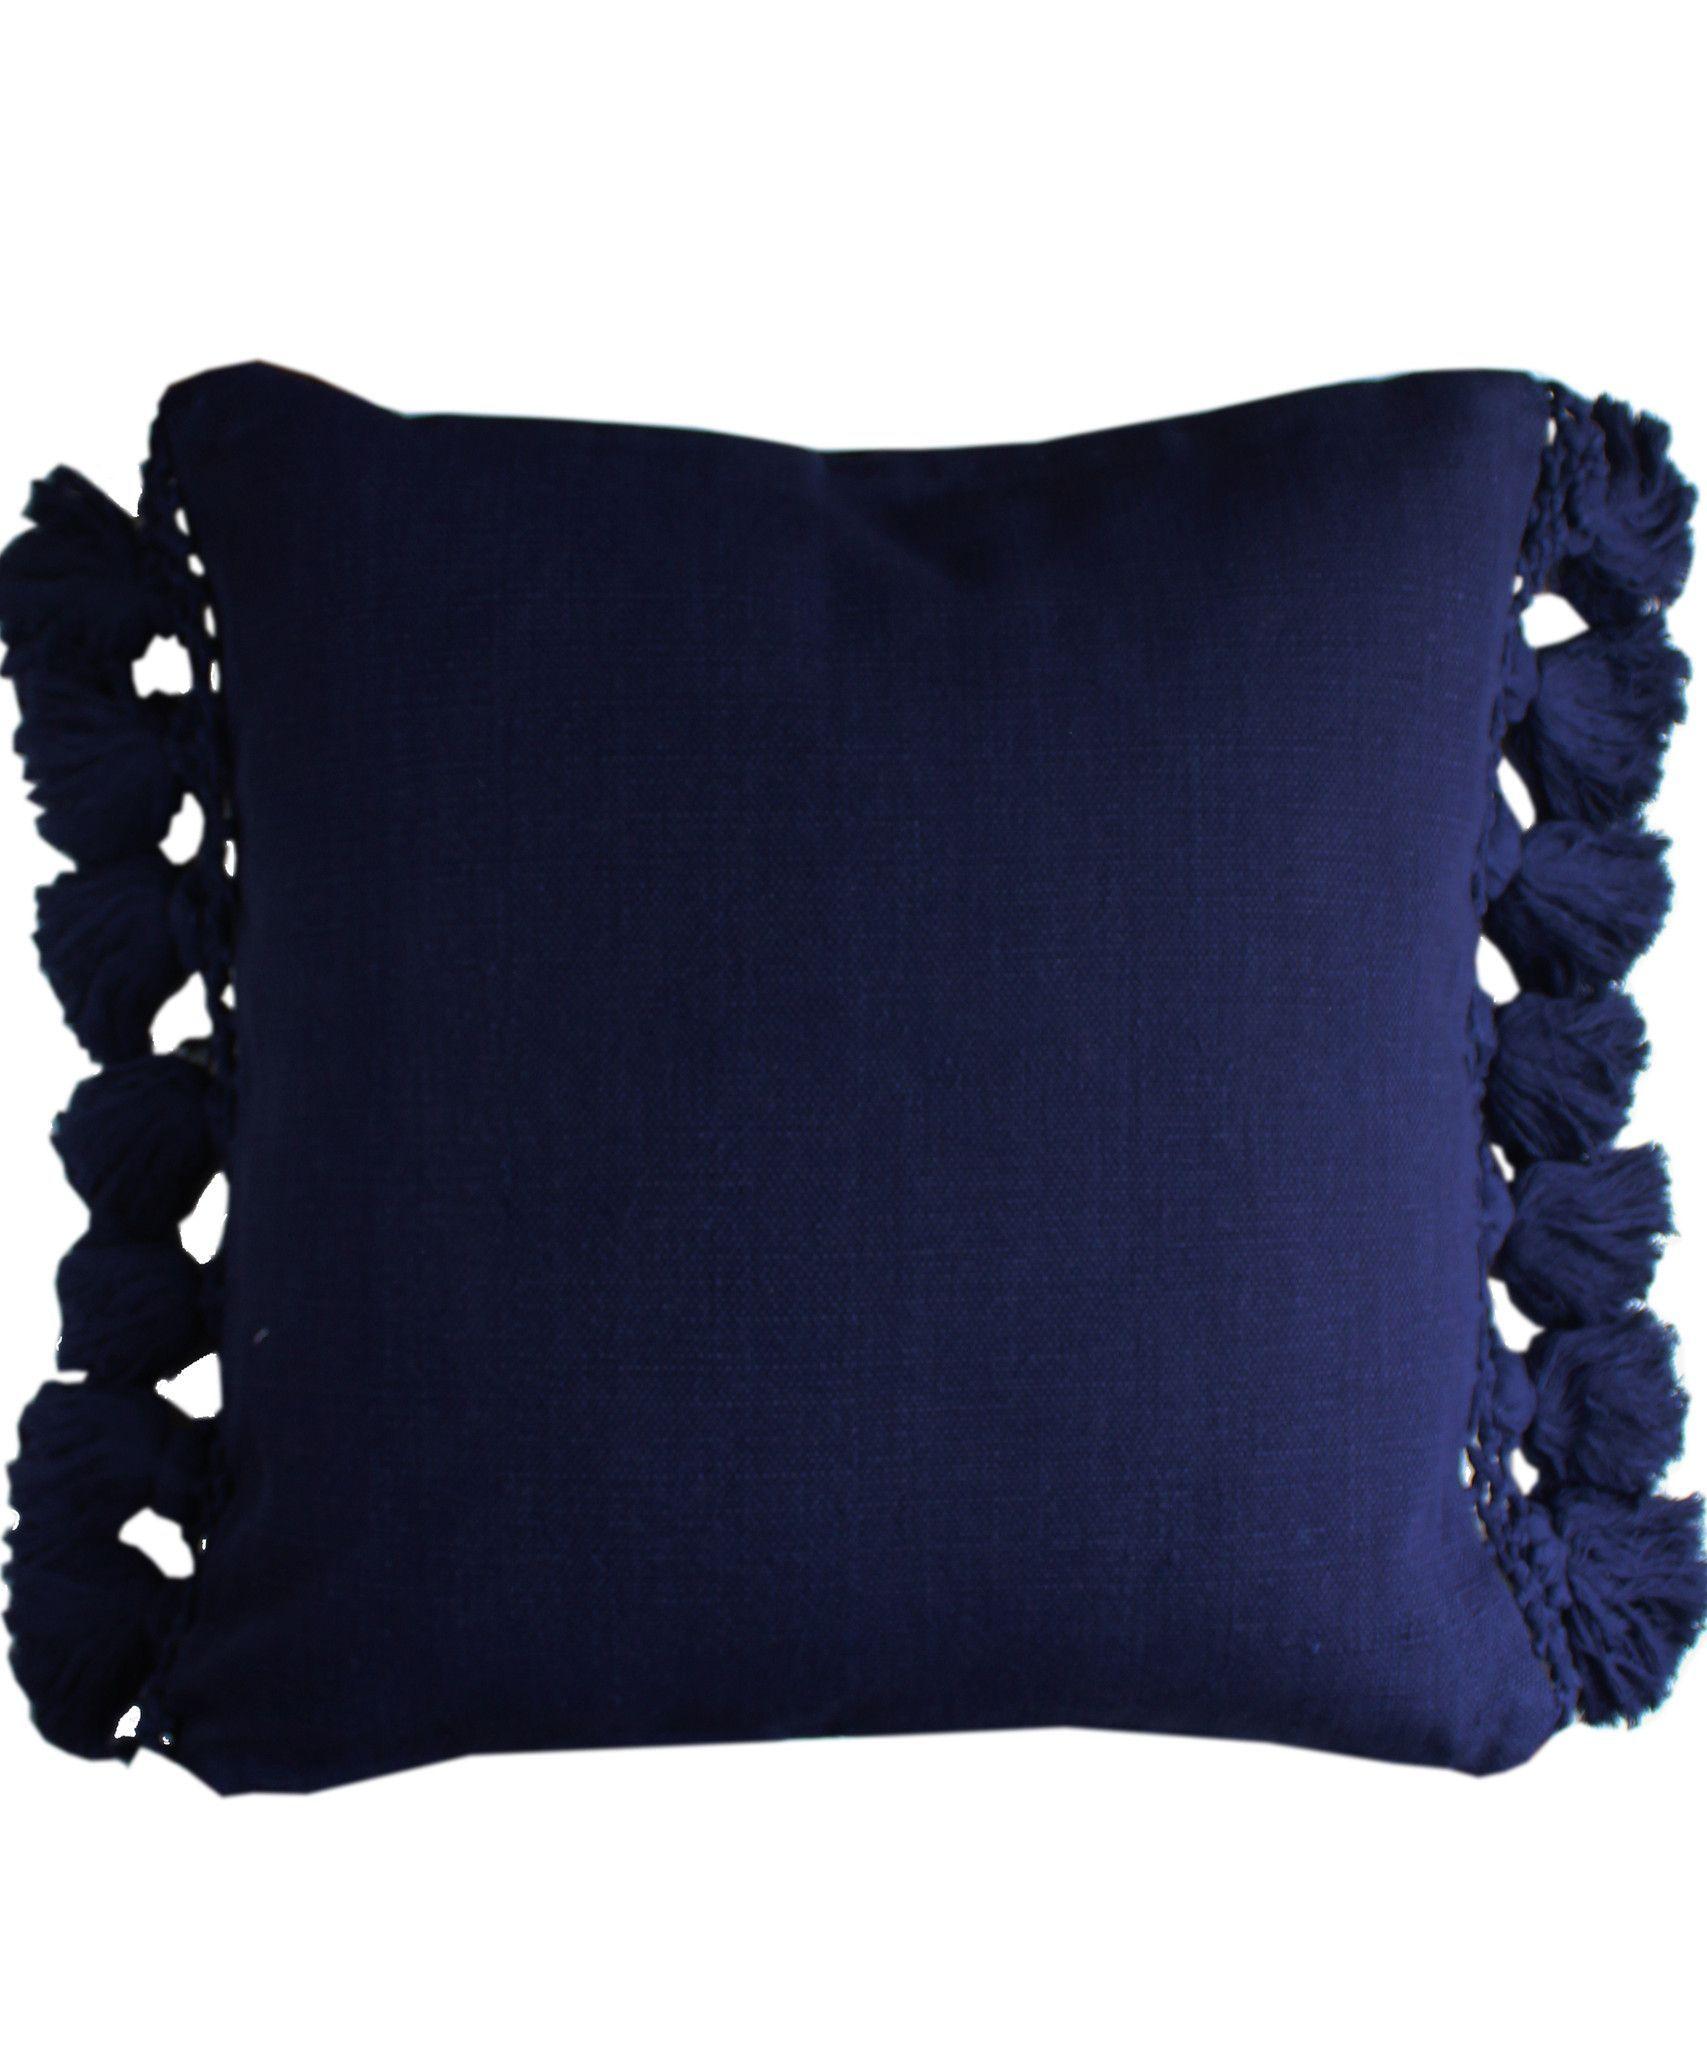 Kate Spade Tassel Pillow Navy Tassel Pillow Pillows Kate Spade Bedroom